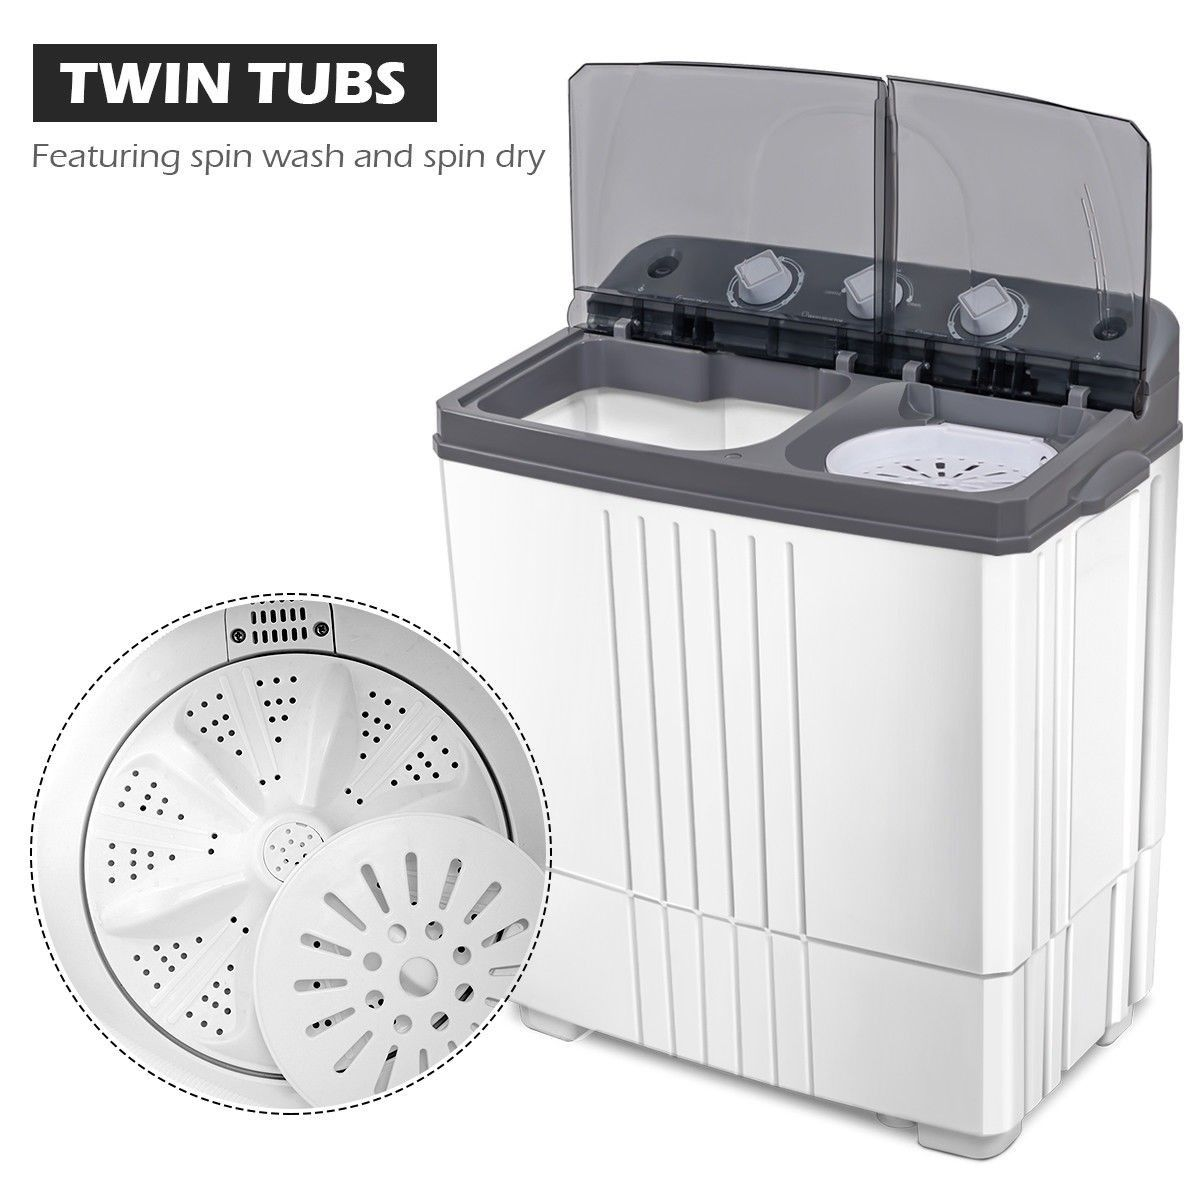 Twin Tub Portable Mini Washing Machine Twin Tub Mini Washing